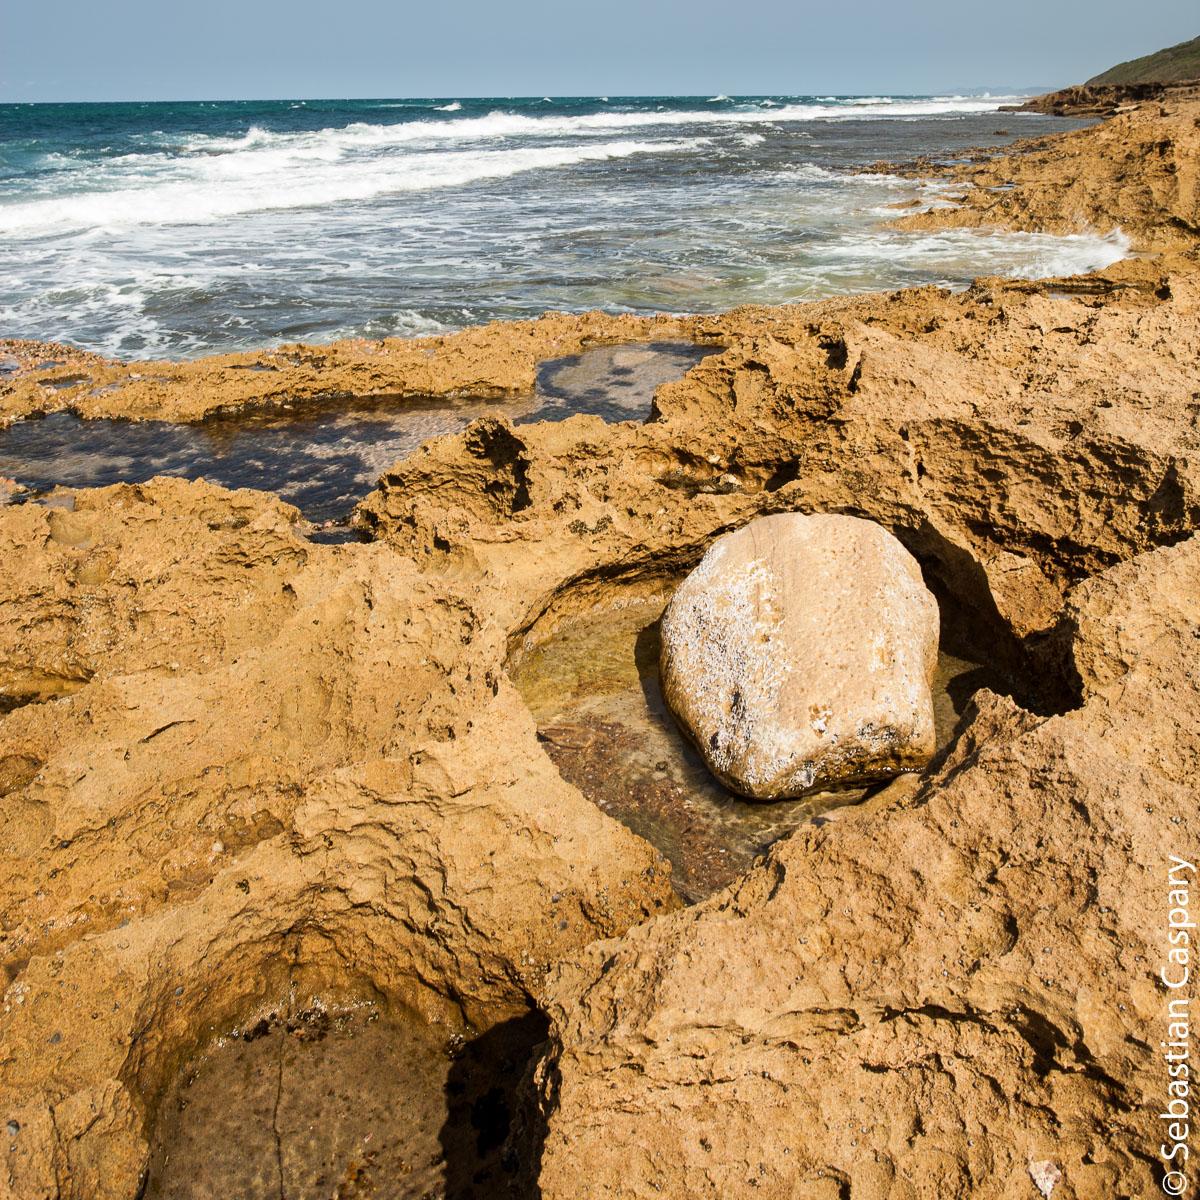 Am indischen Ozean am Cape Vidal.